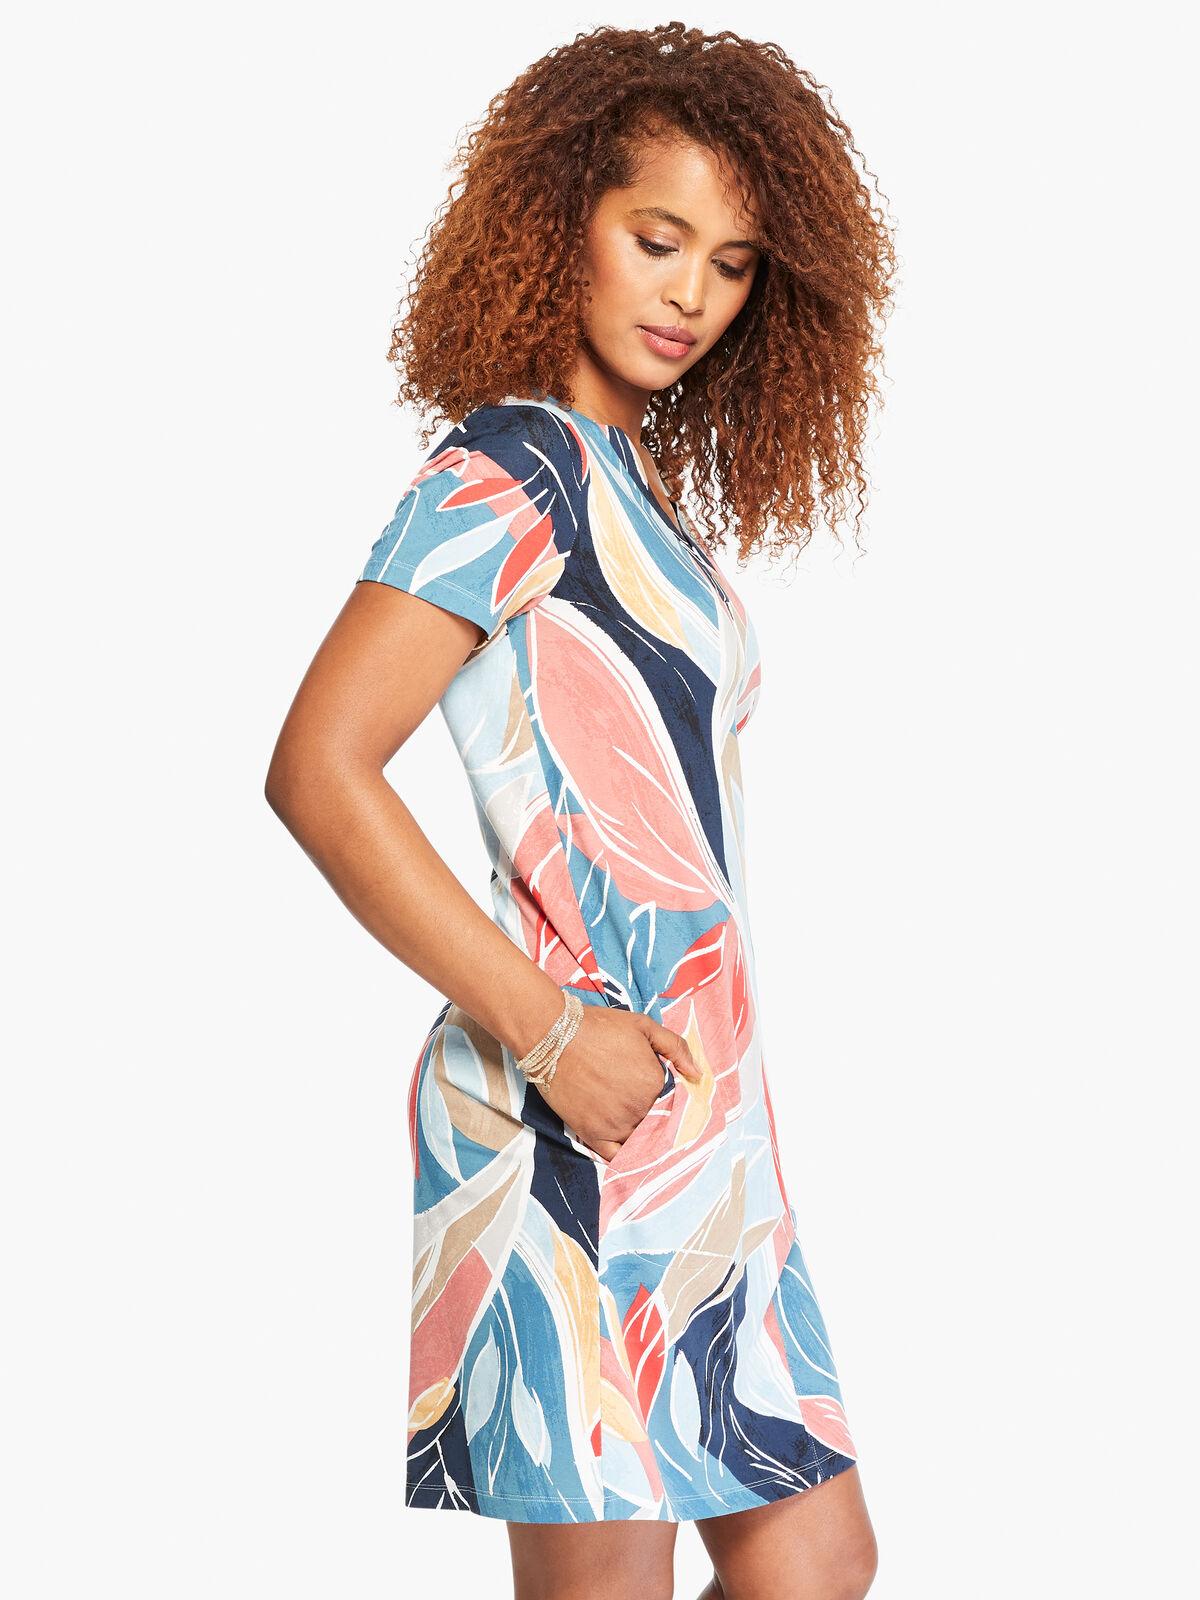 Breezy Leaves Dress